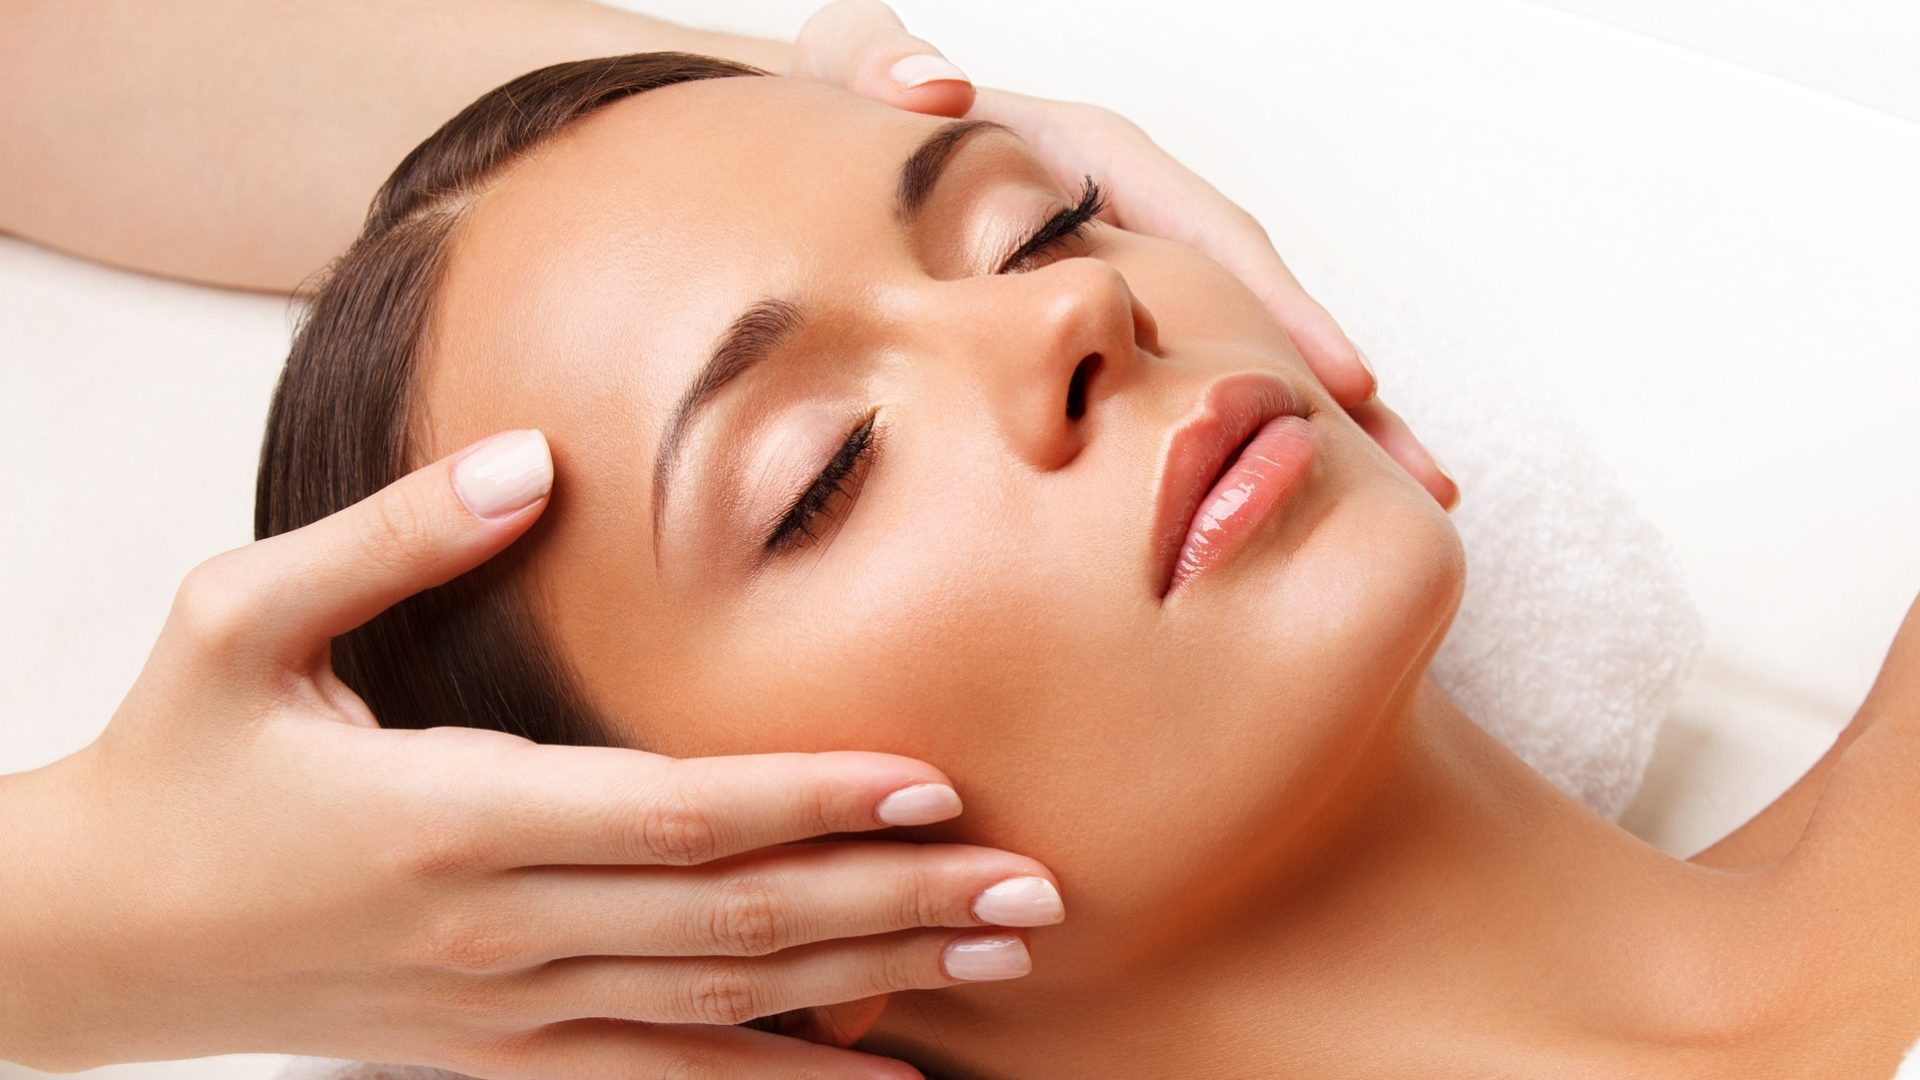 Нивалин при лечении миастении